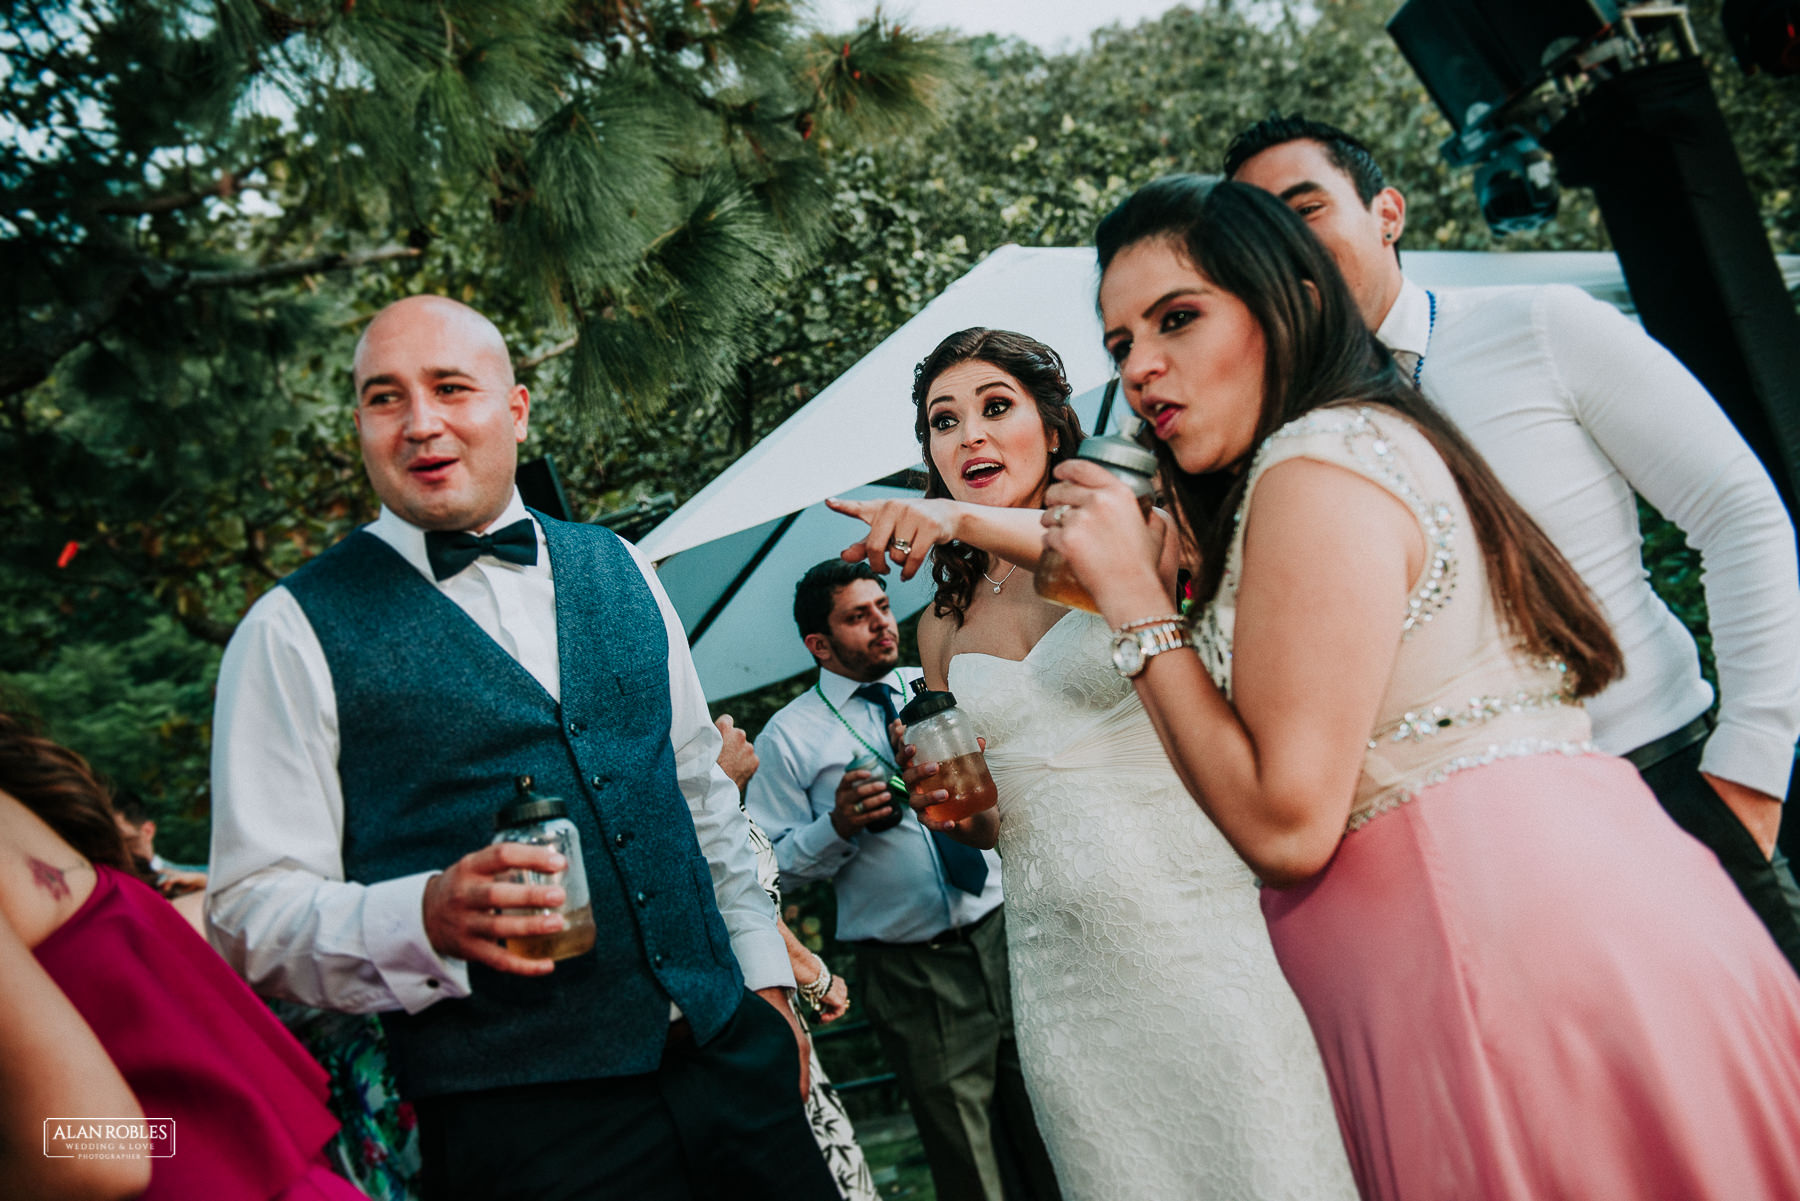 Fotografo de bodas guadalajara Alan Robles - Pinare terraza bistro 56